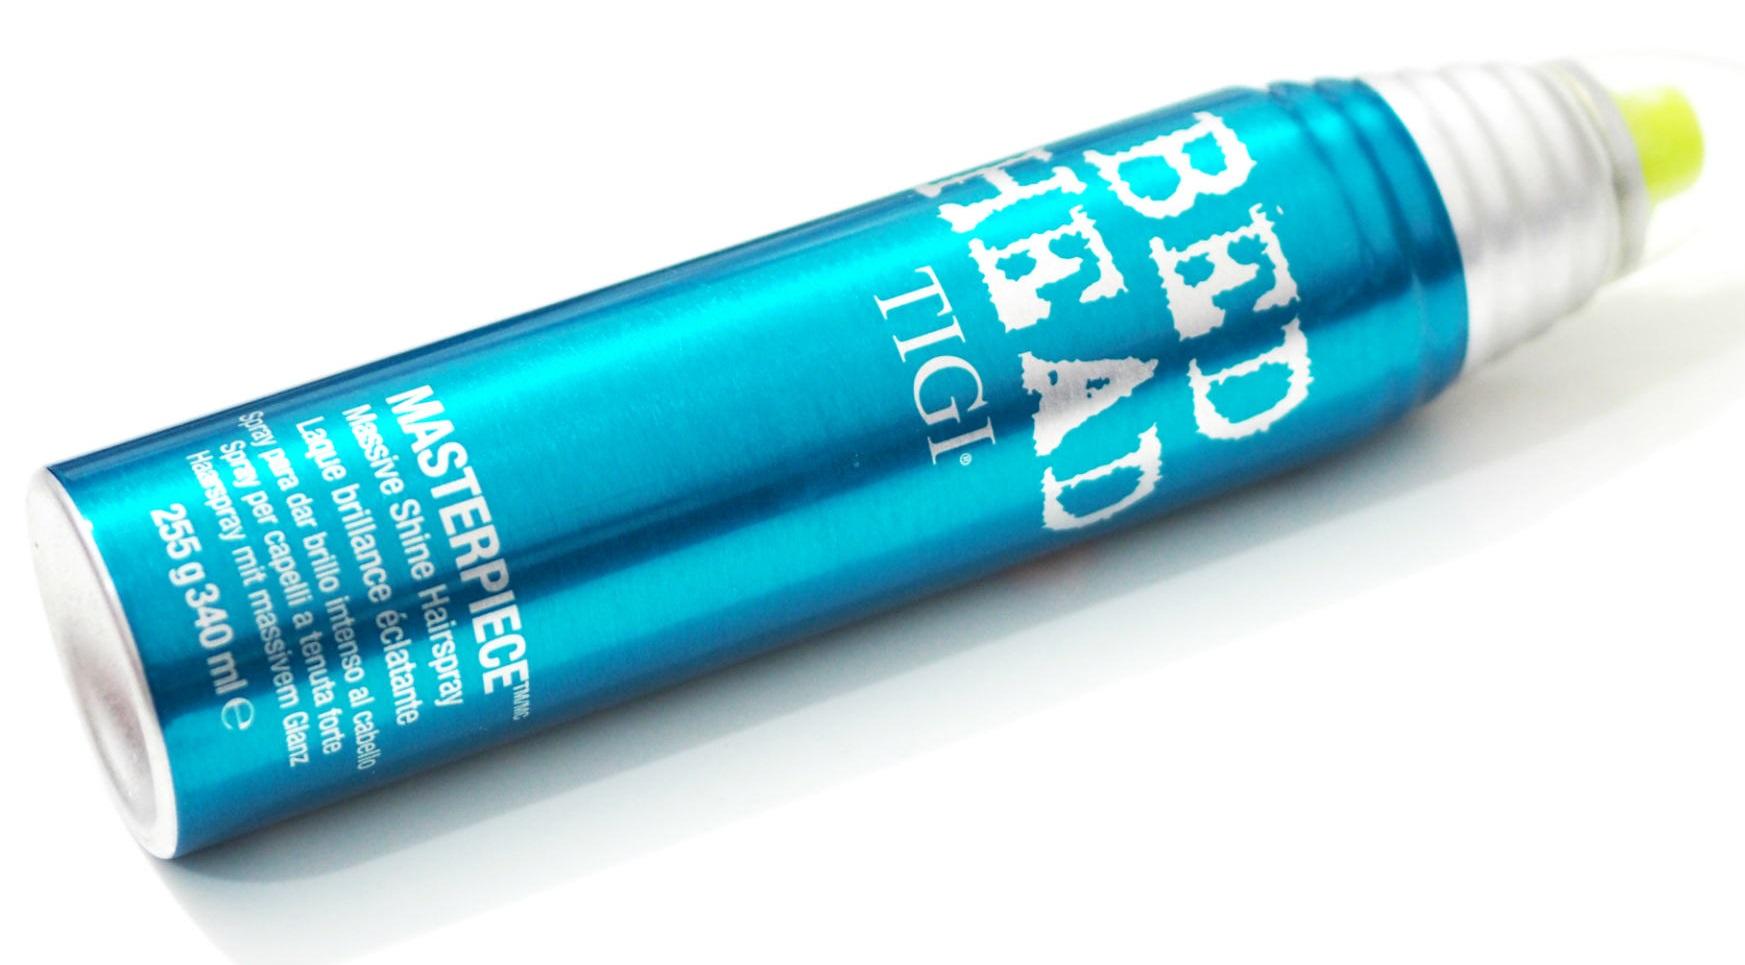 Tigi Bed Head Masterpiece Massive Shine Hairspray - Лак для волосся з інтенсивним блиском, 300 мл, фото _ab__is.image_number.default